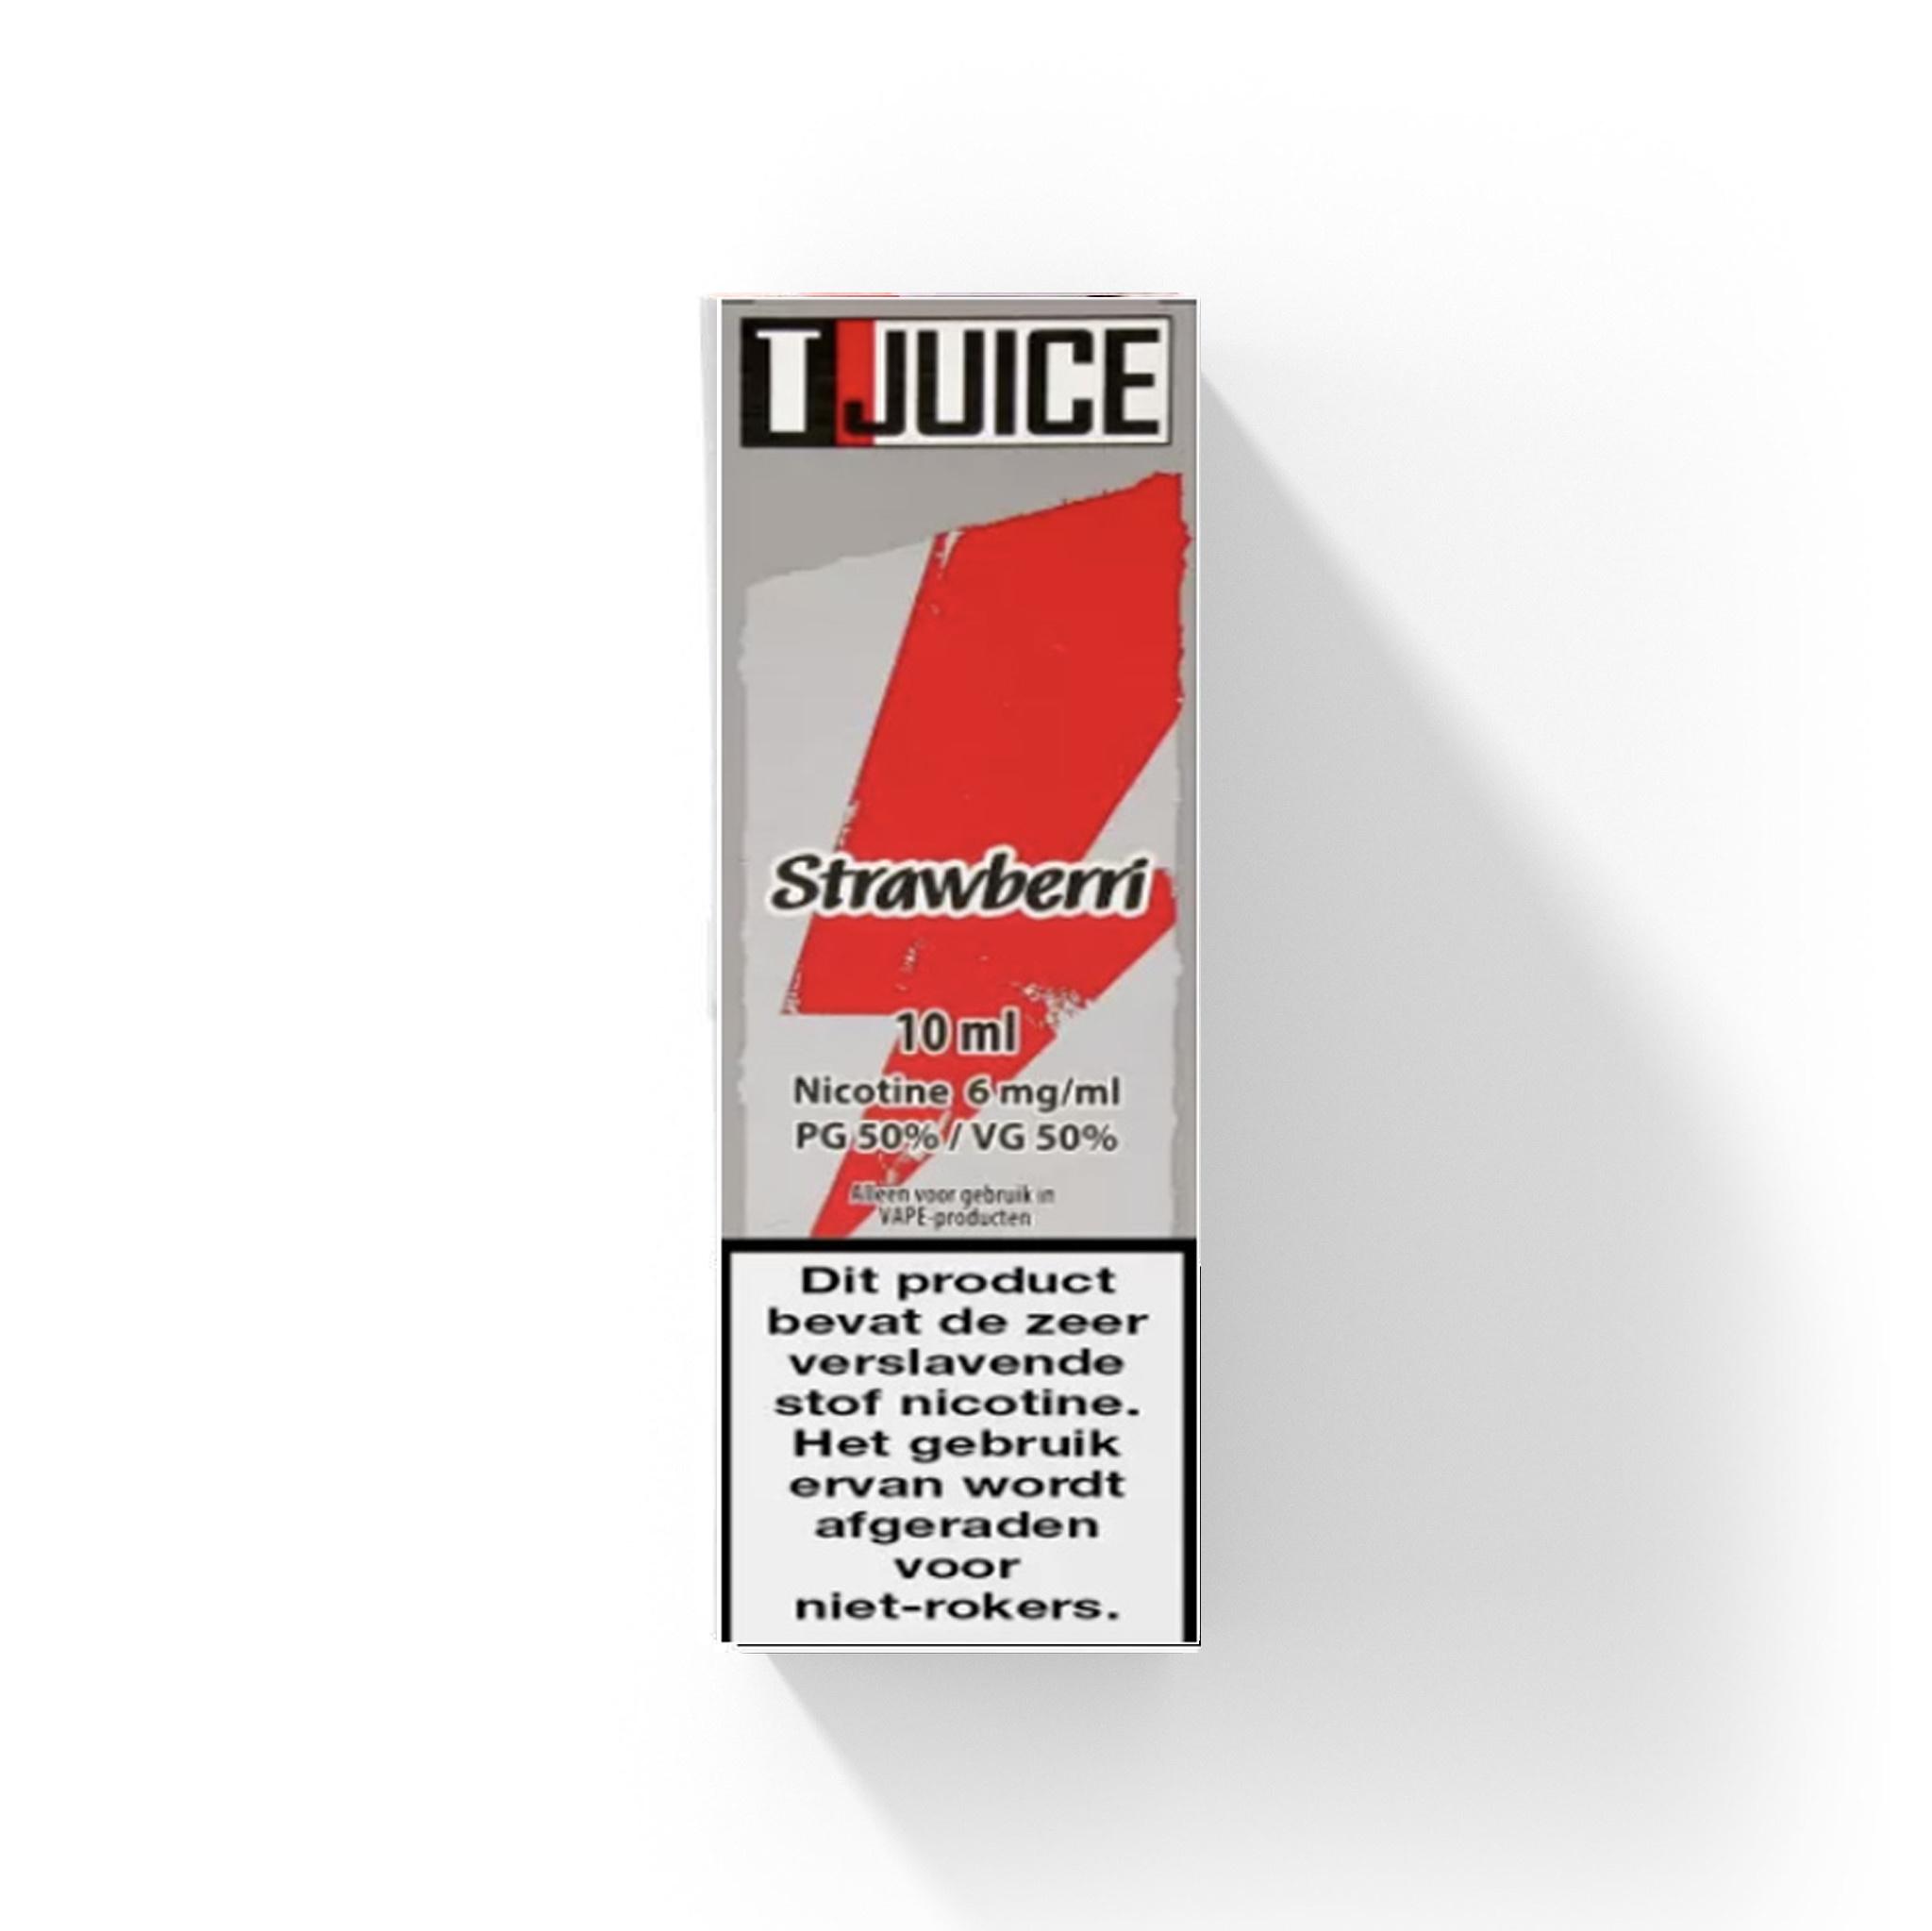 T-Juice - Strawberri